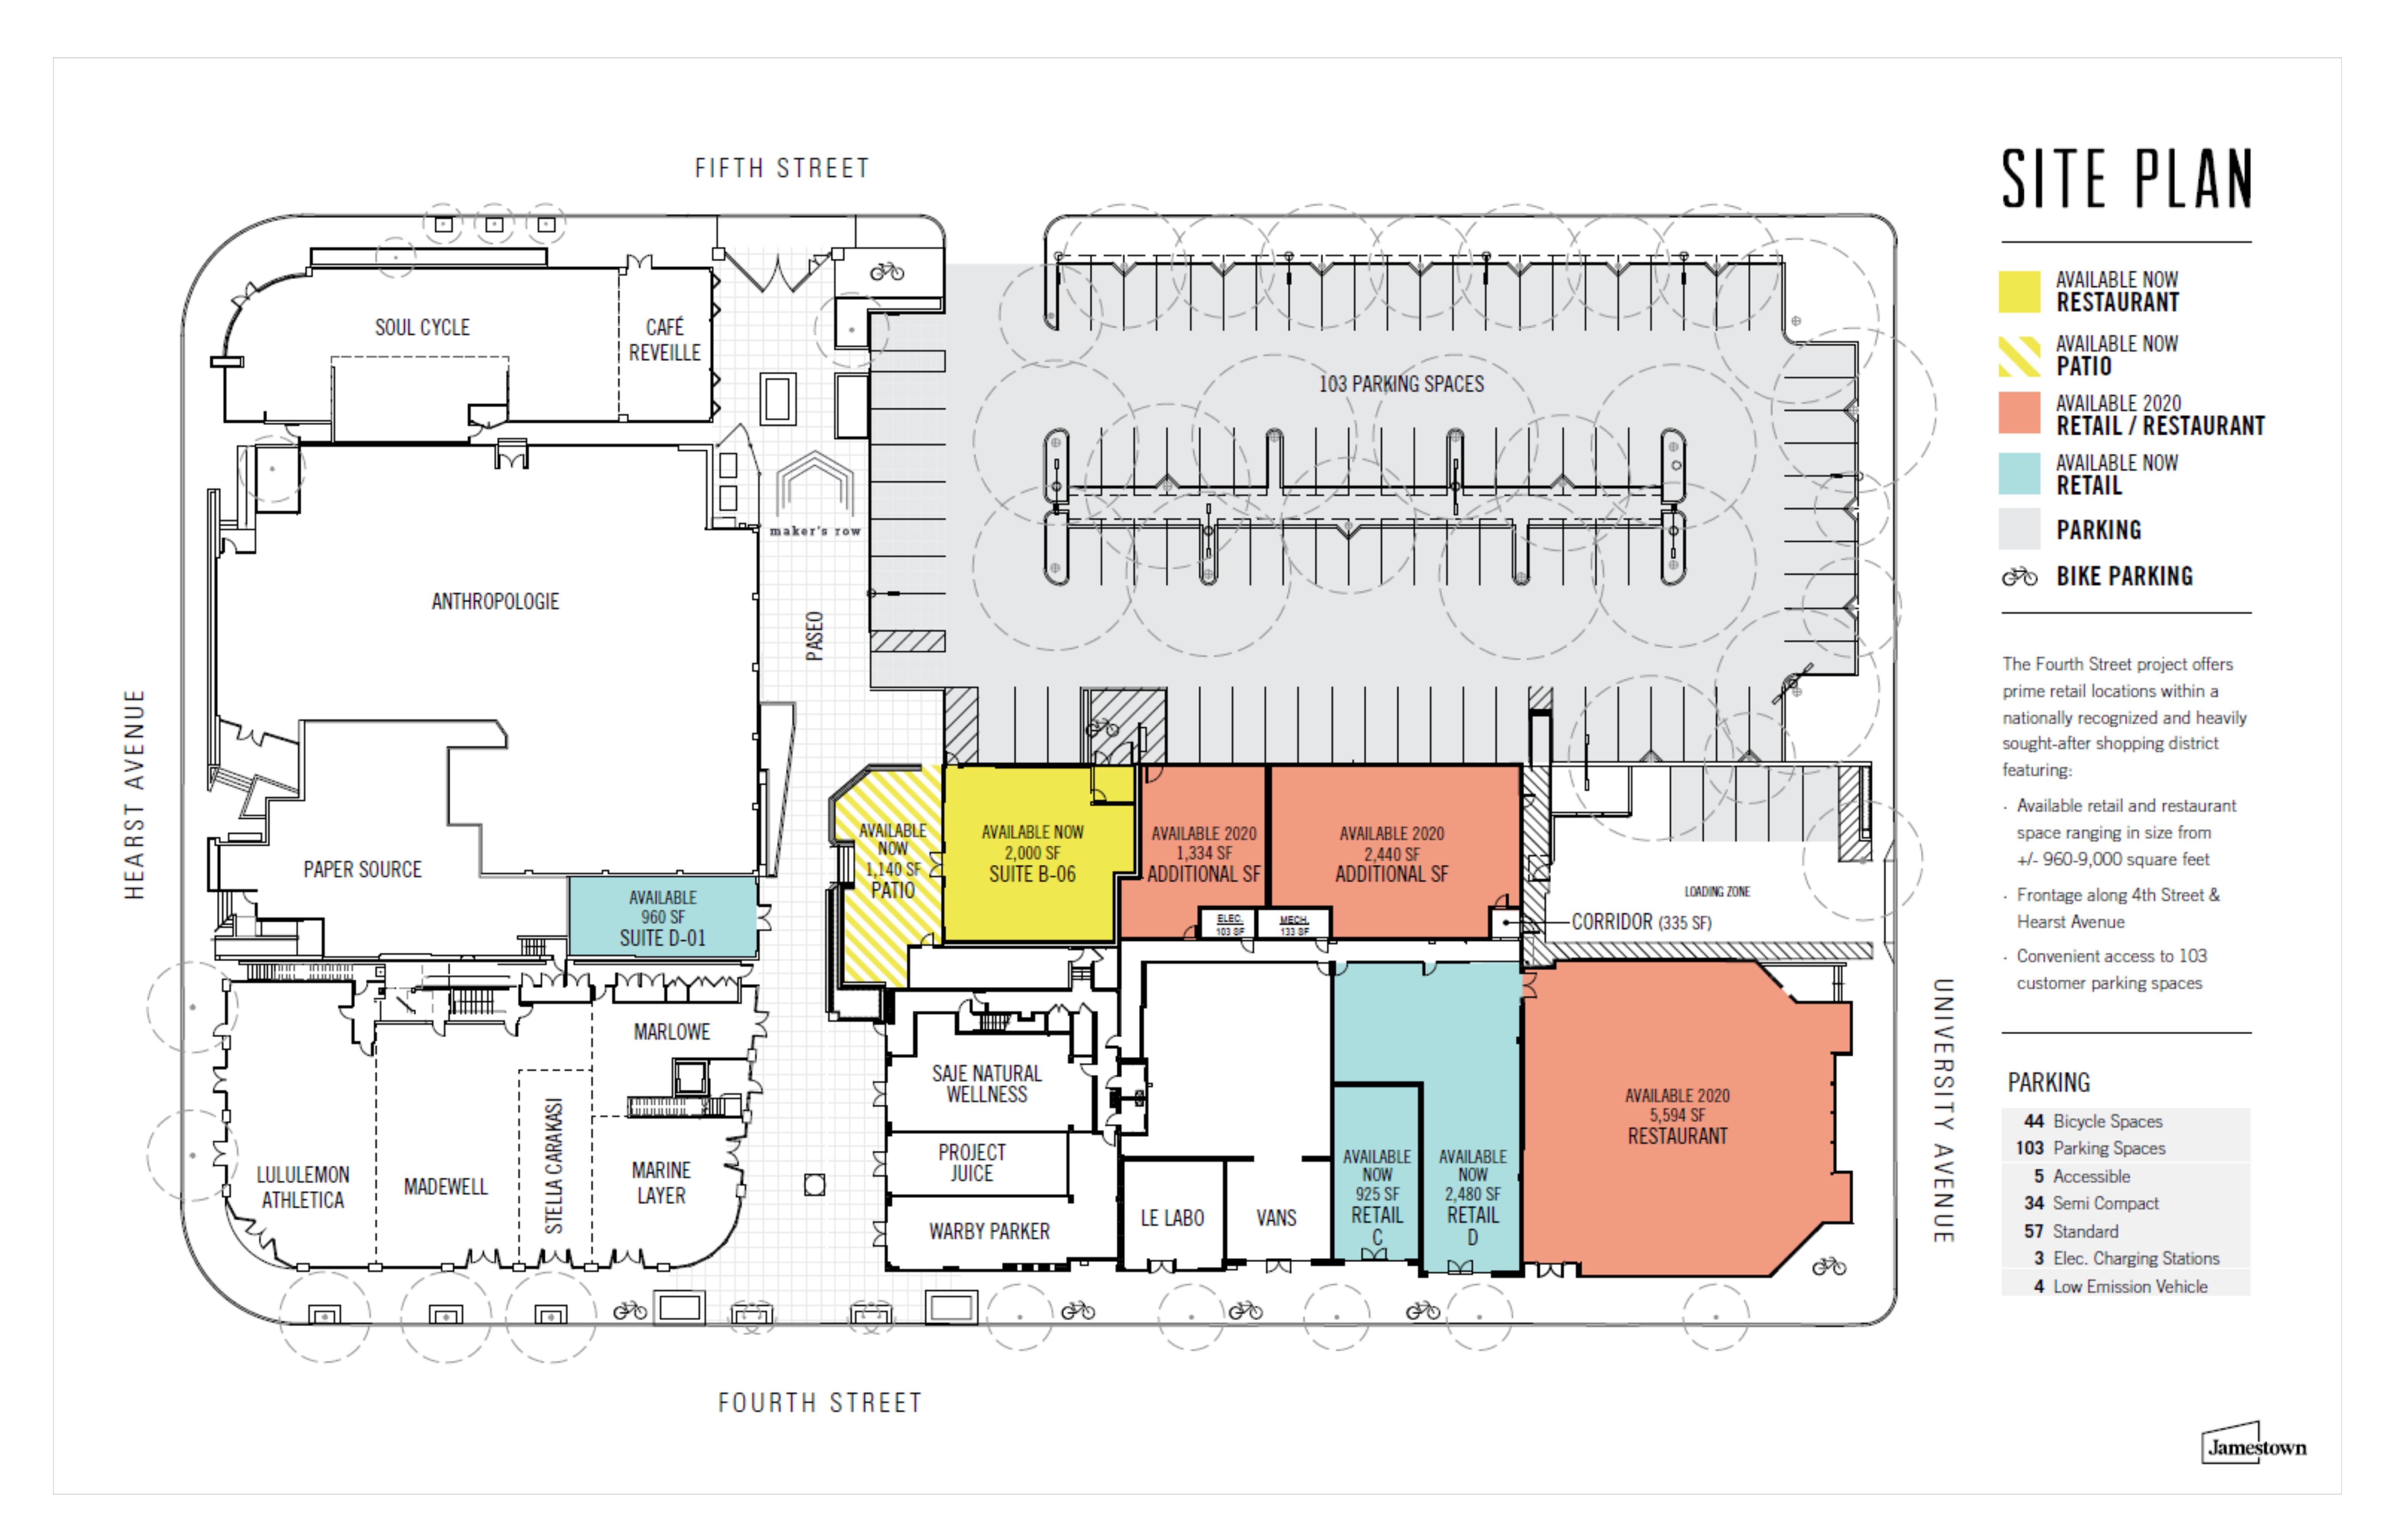 1919 Fourth Street - Berkeley: site plan